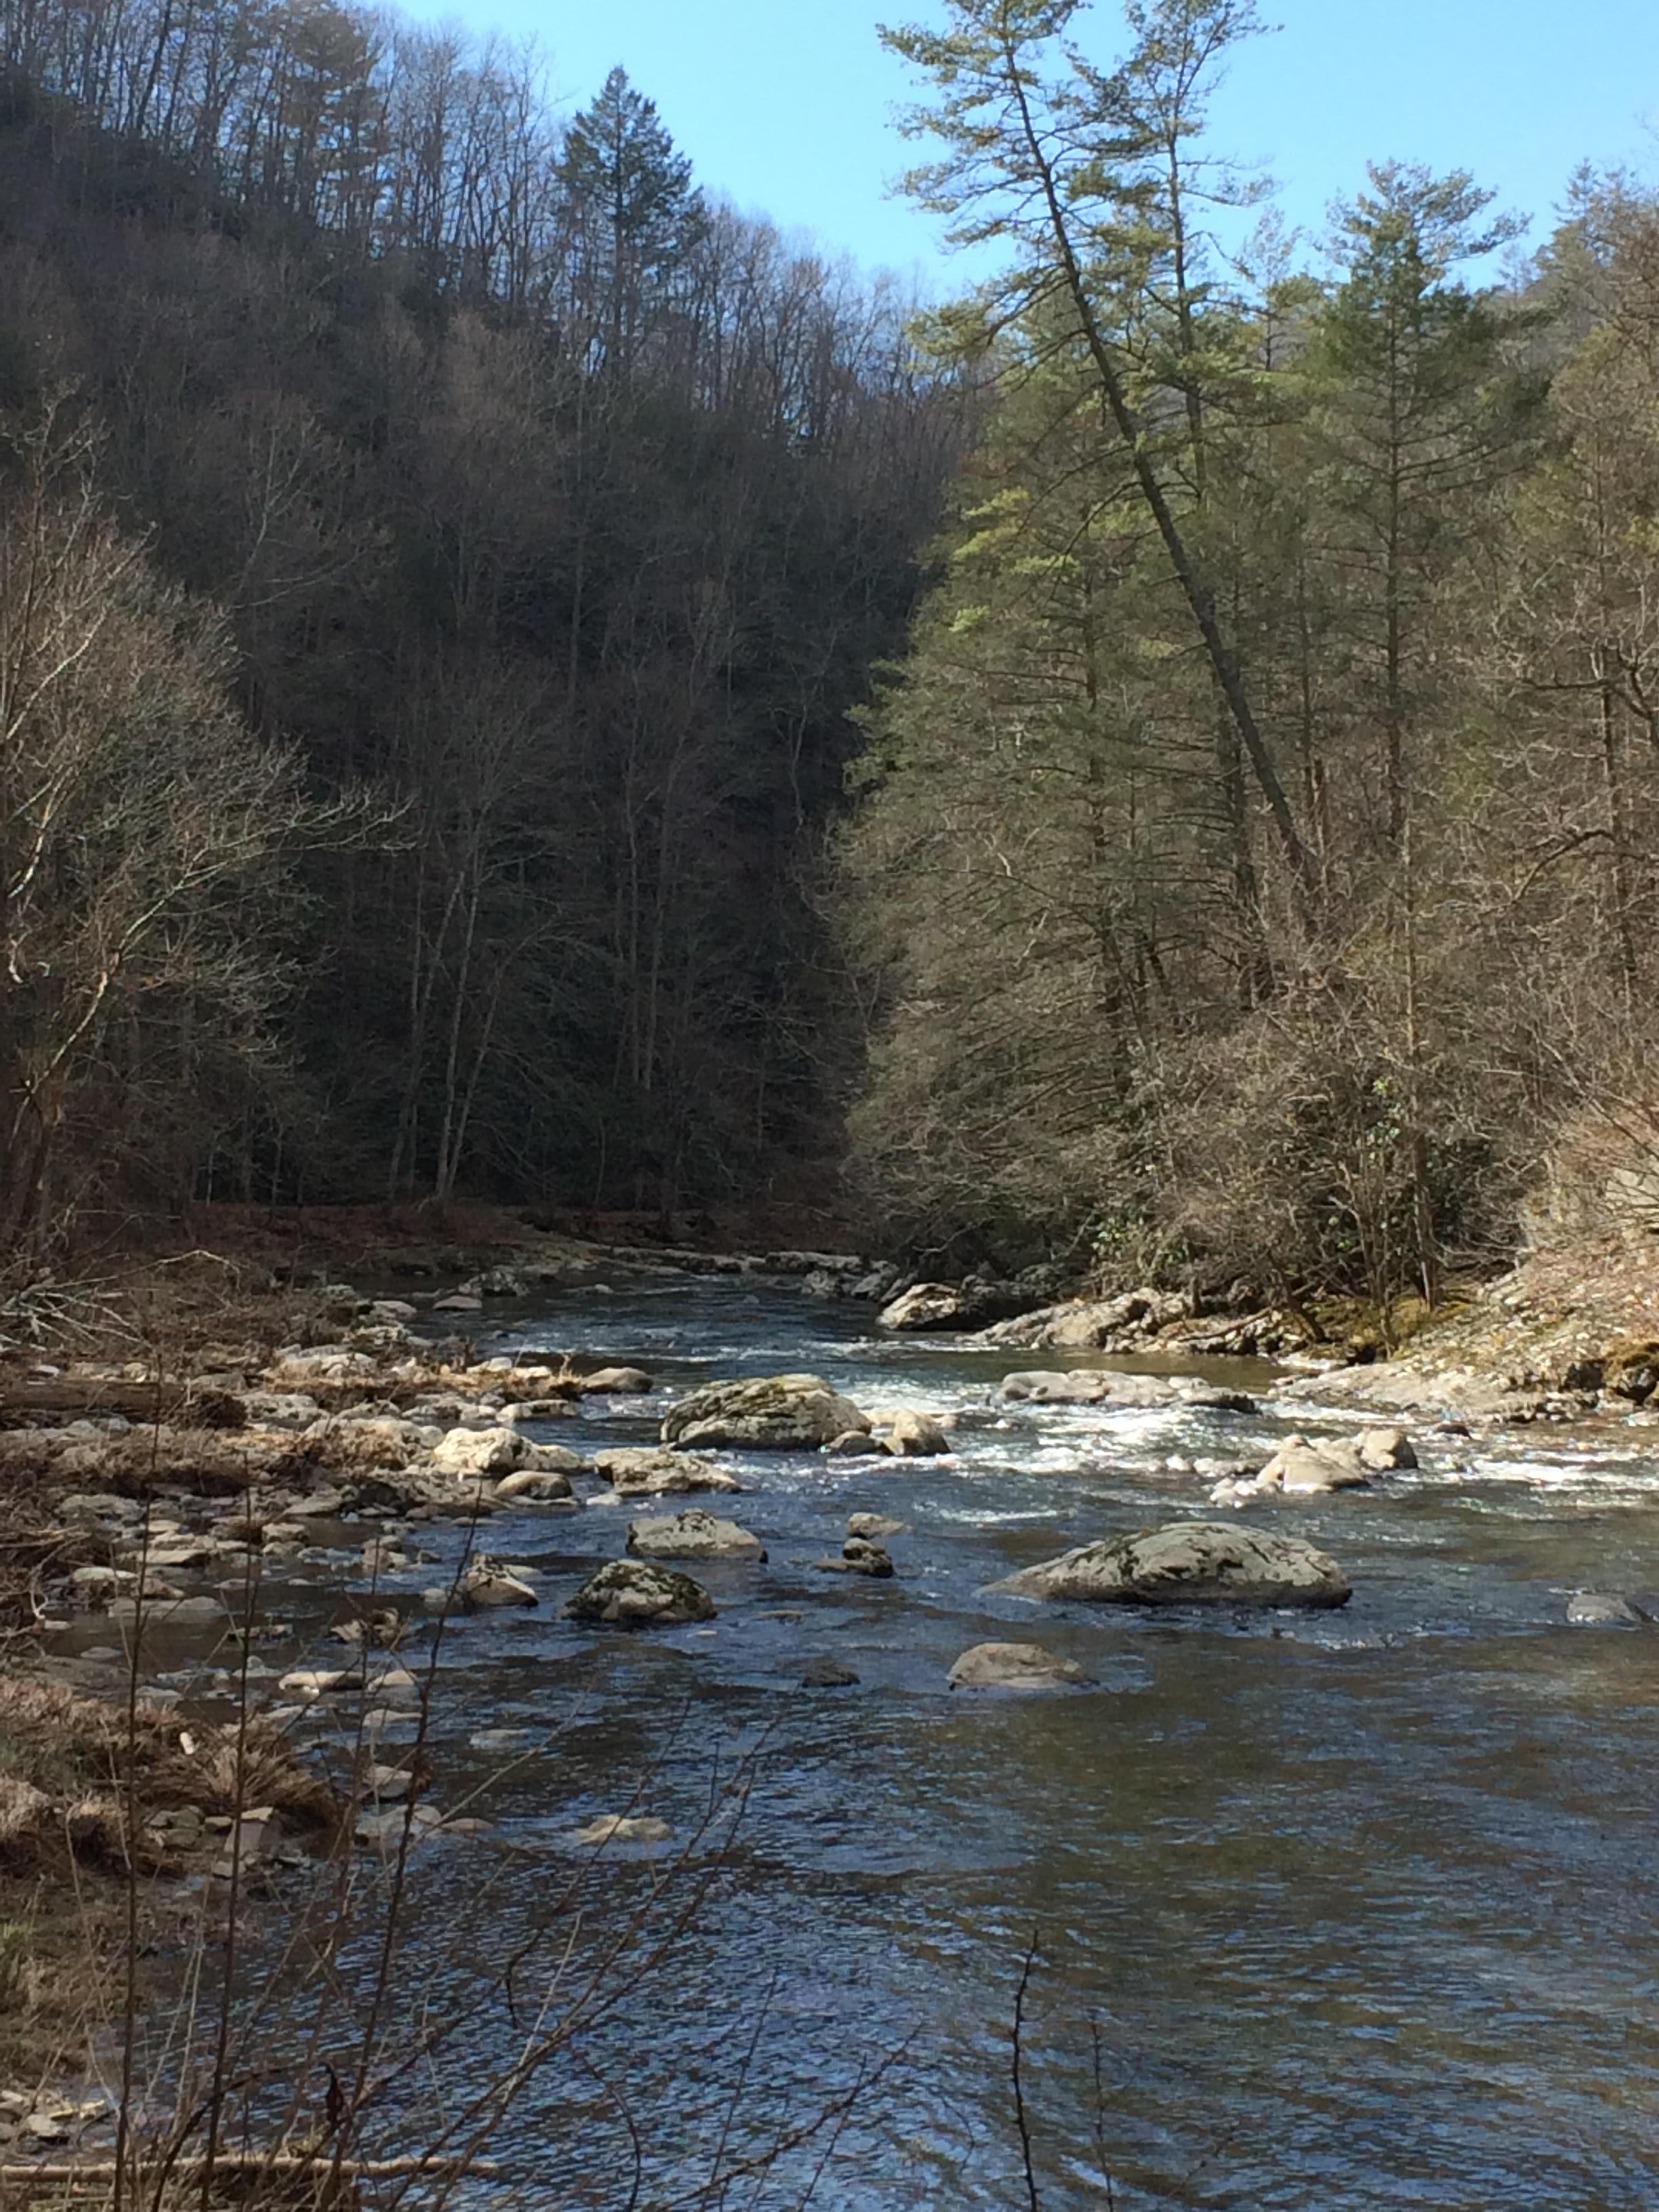 The Laurel River (near Hot Springs, NC)